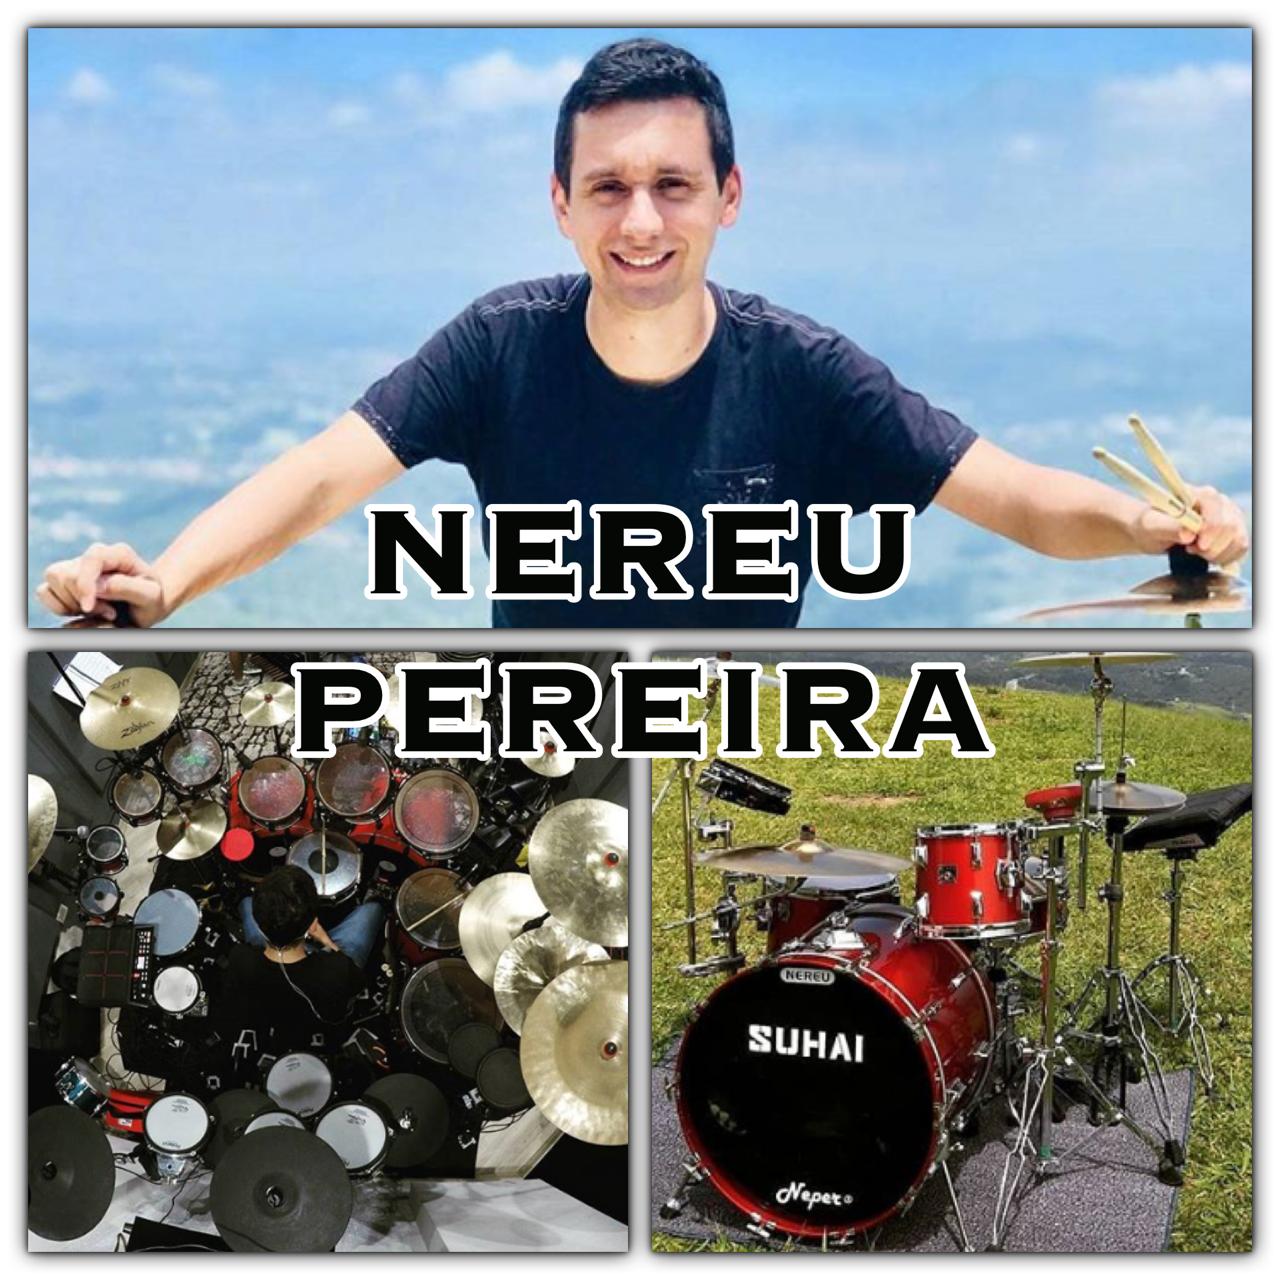 NEREU PEREIRA